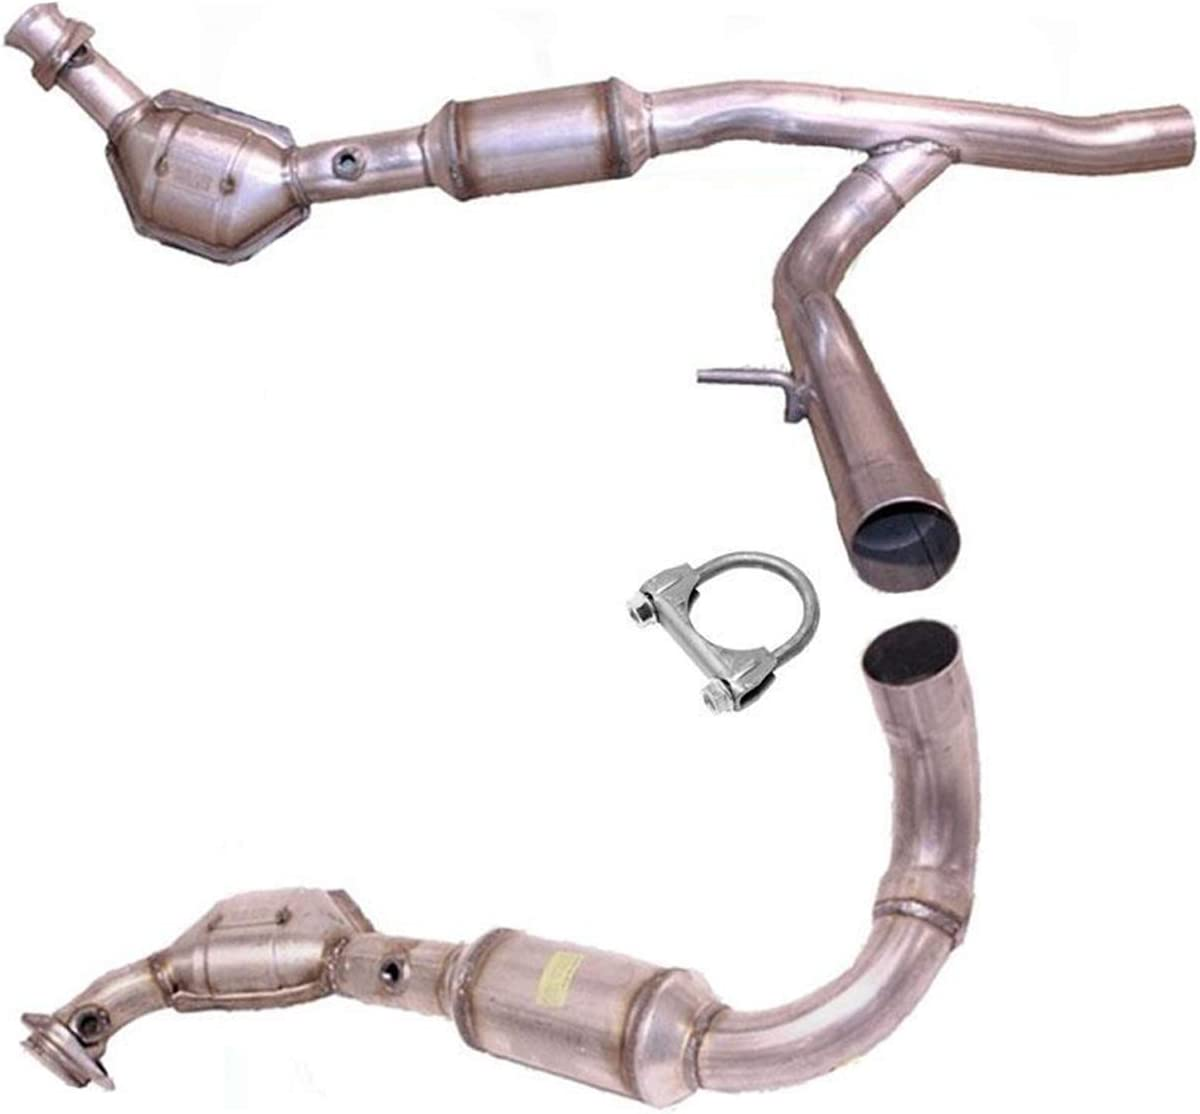 MagnaFlow 24090 Direct Fit Catalytic Converter Non CARB compliant